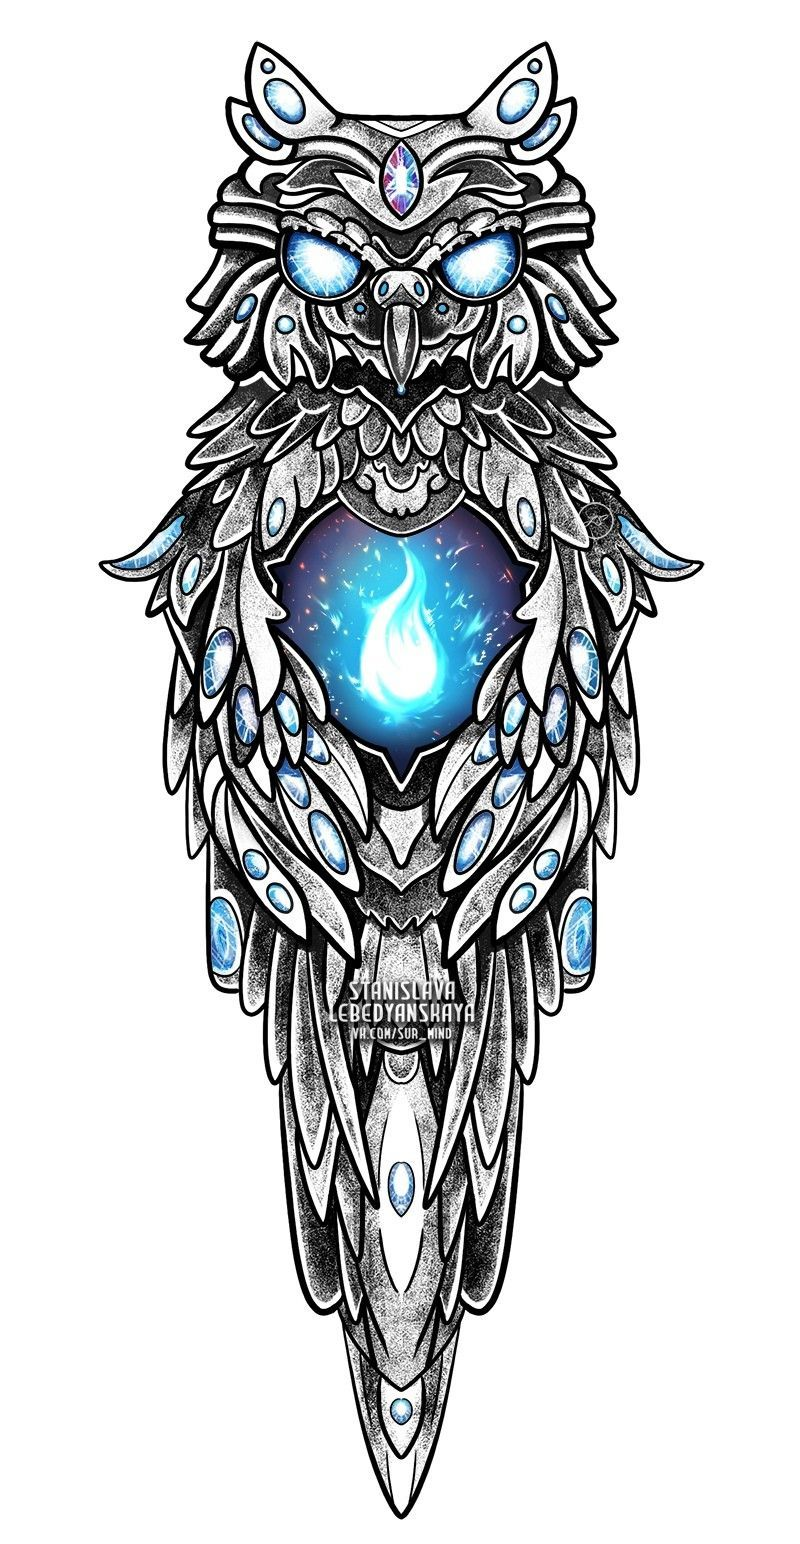 Blaue Eule In 2020 Owl Tattoo Drawings Sketch Tattoo Design Tattoo Drawings